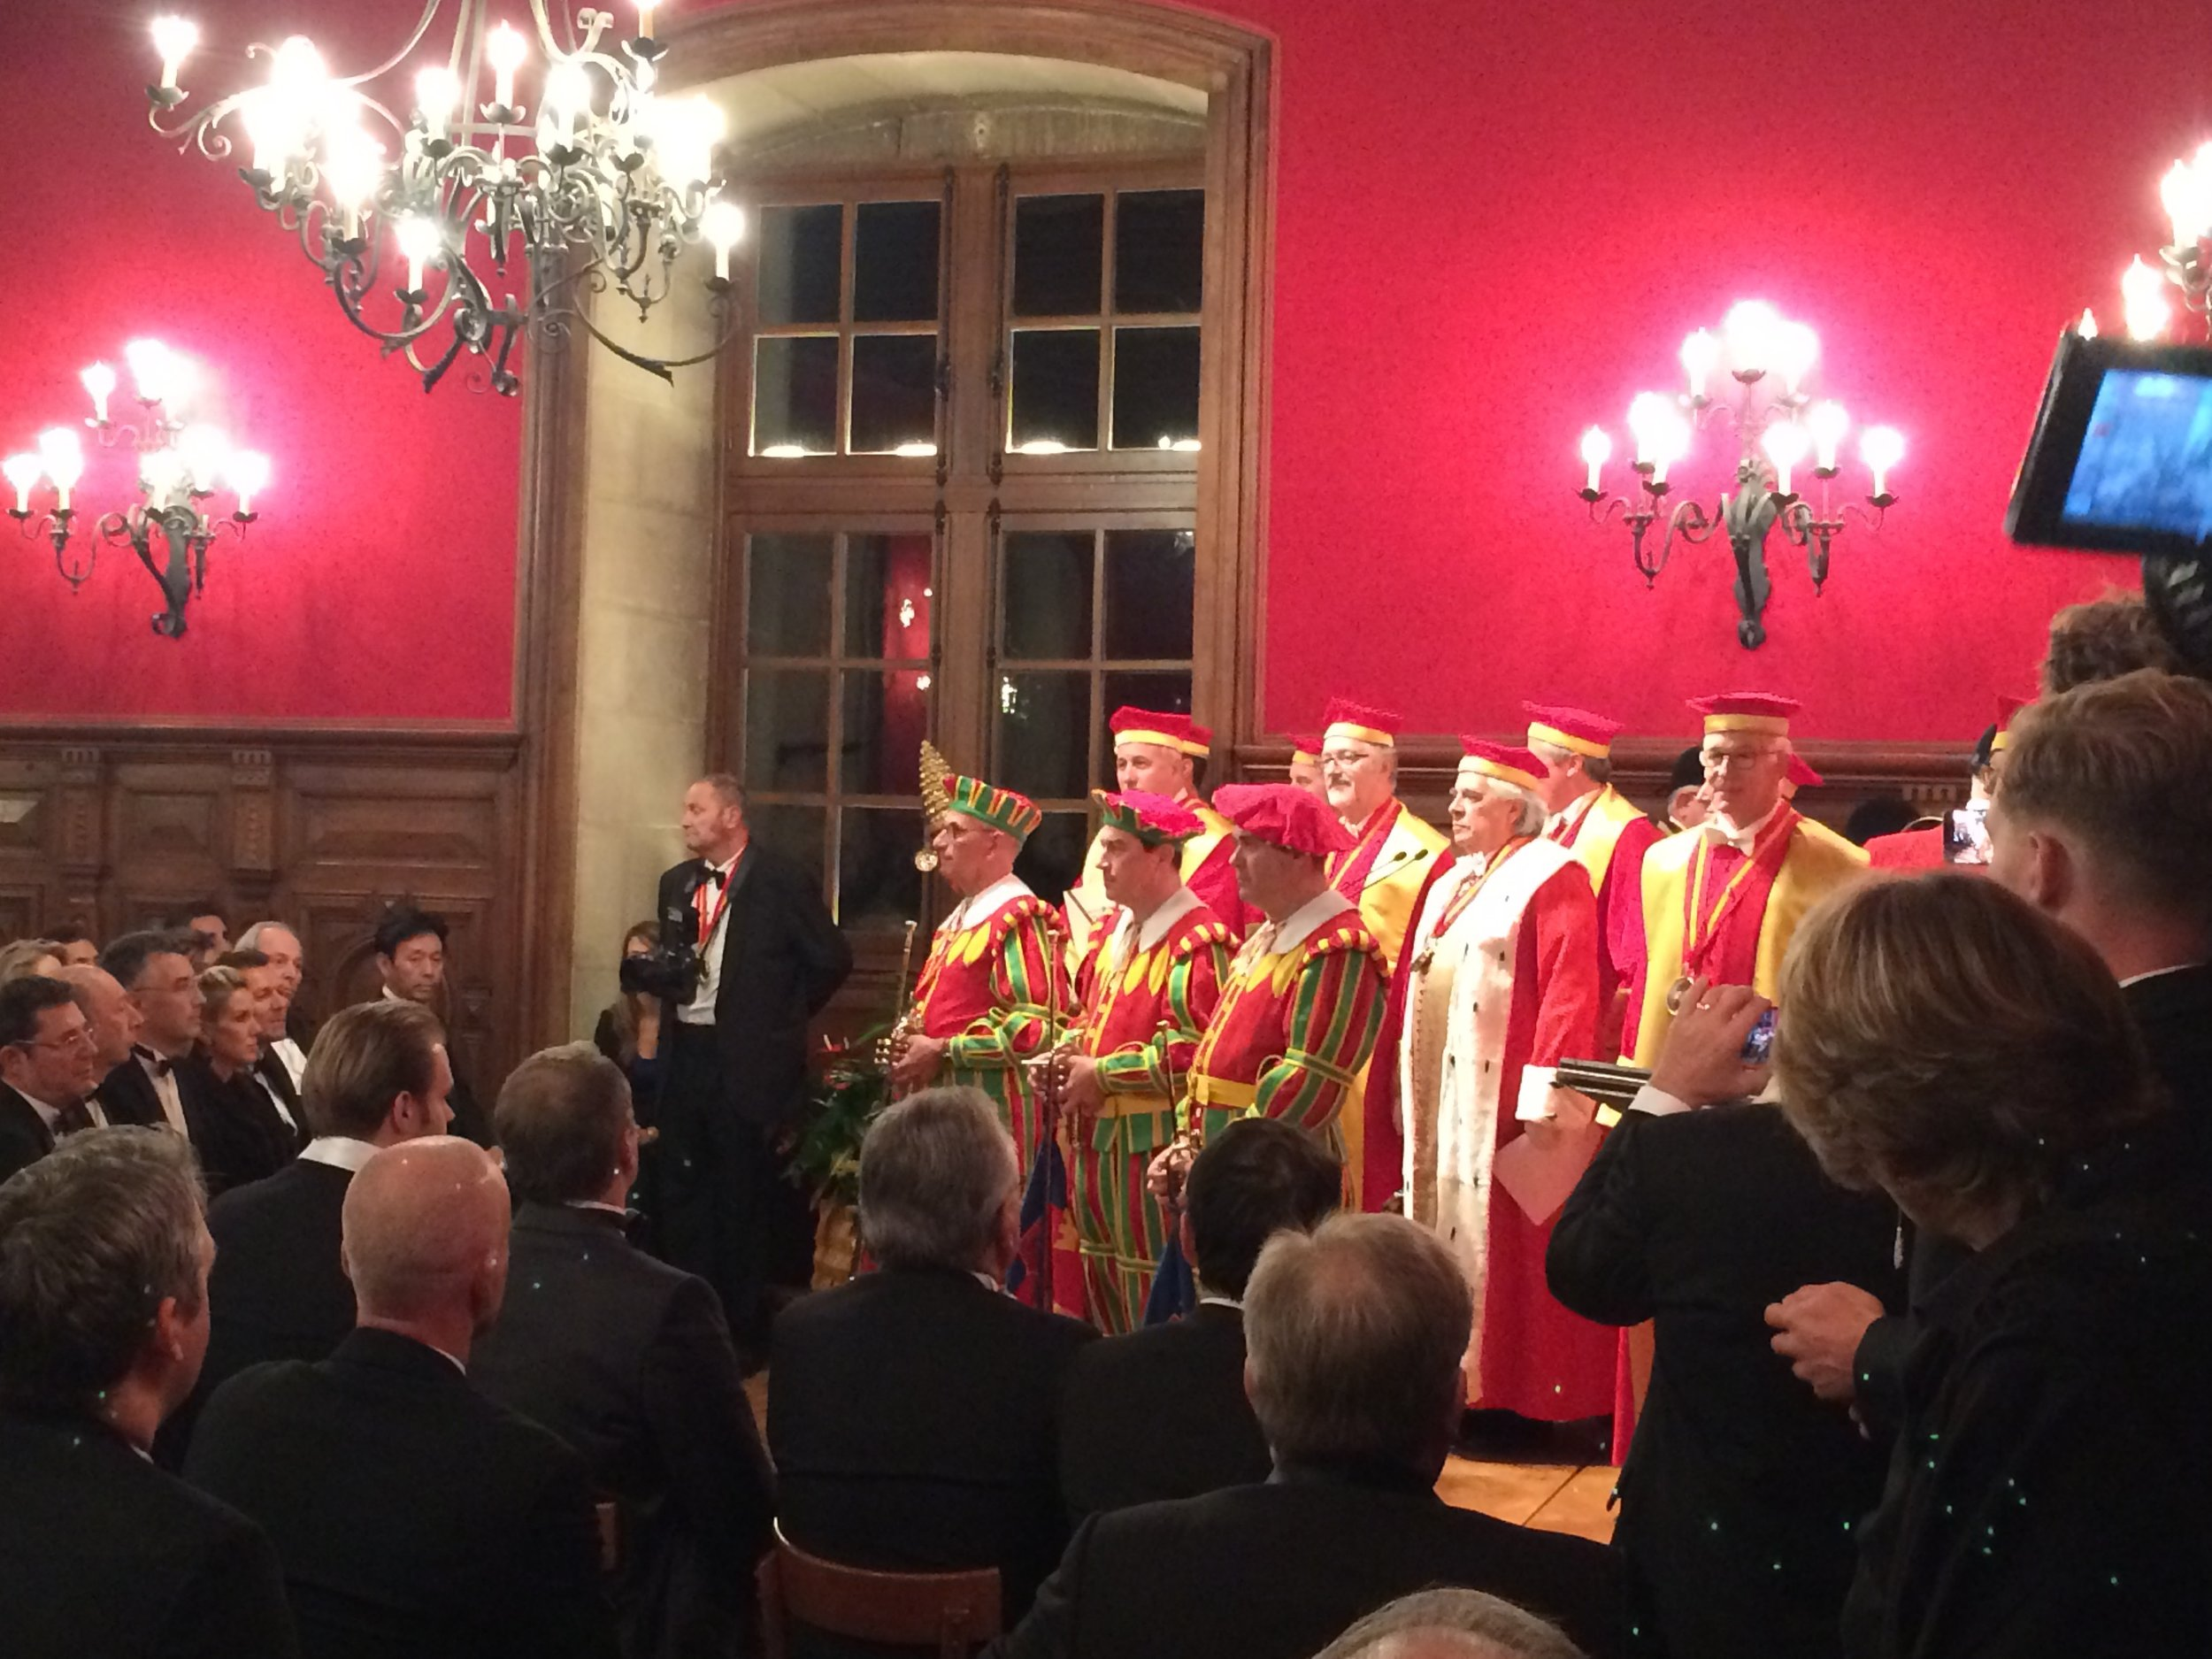 Induction ceremonies underway for the Chevaliers du Tastevin